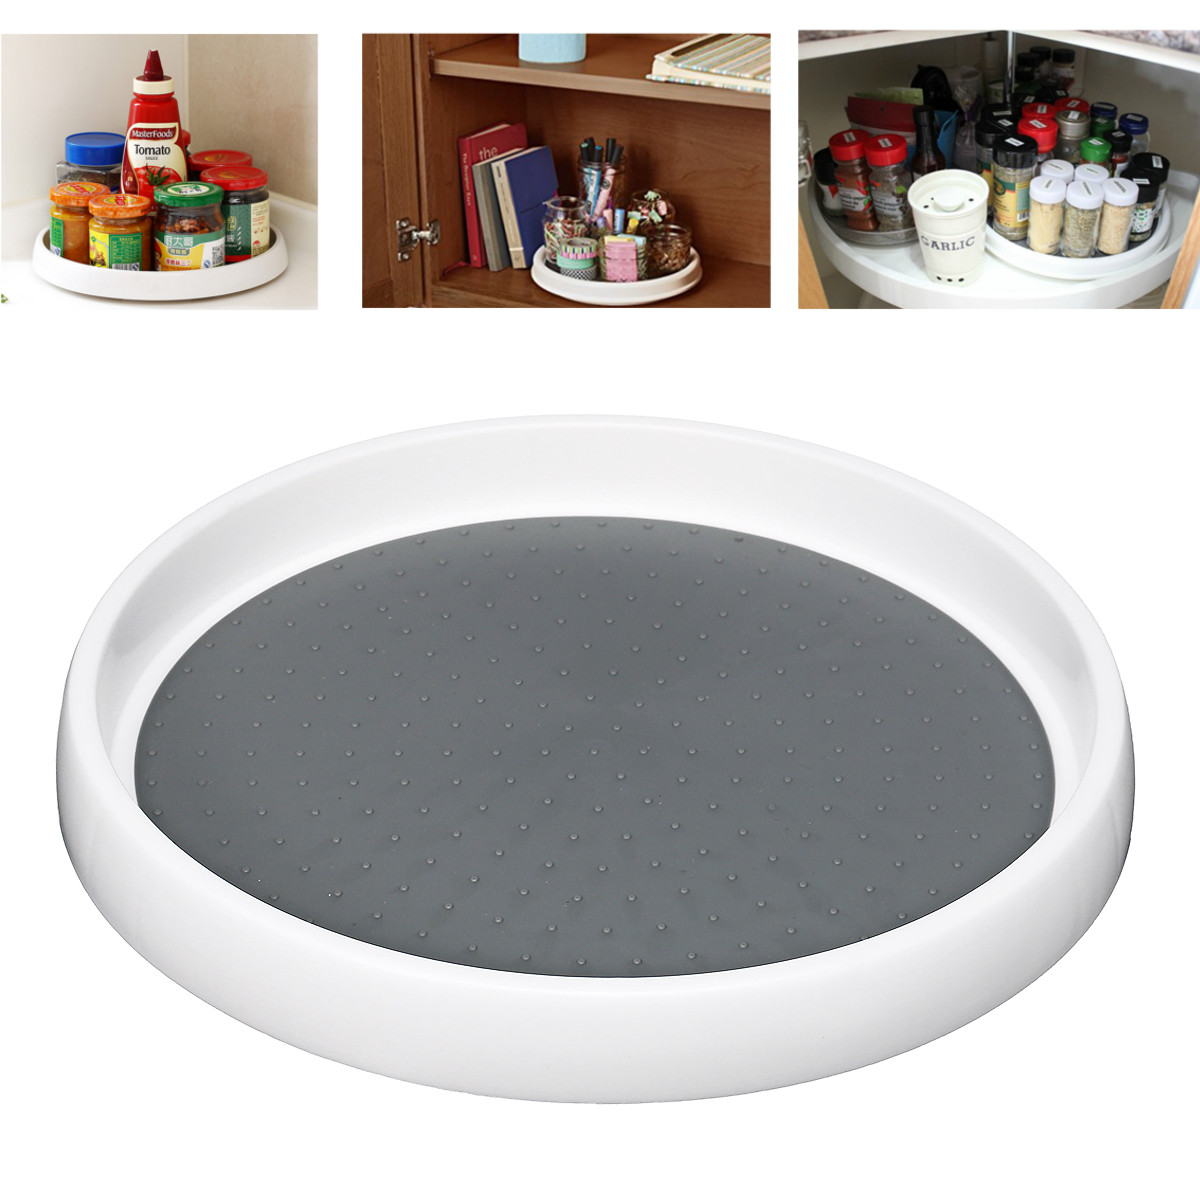 Rotatable Desktop Kitchen Storage Organizer Round Cabinet Spice Seasoning Bottle Holder Rack Jar Shelf Cosmetics Makeup Tray